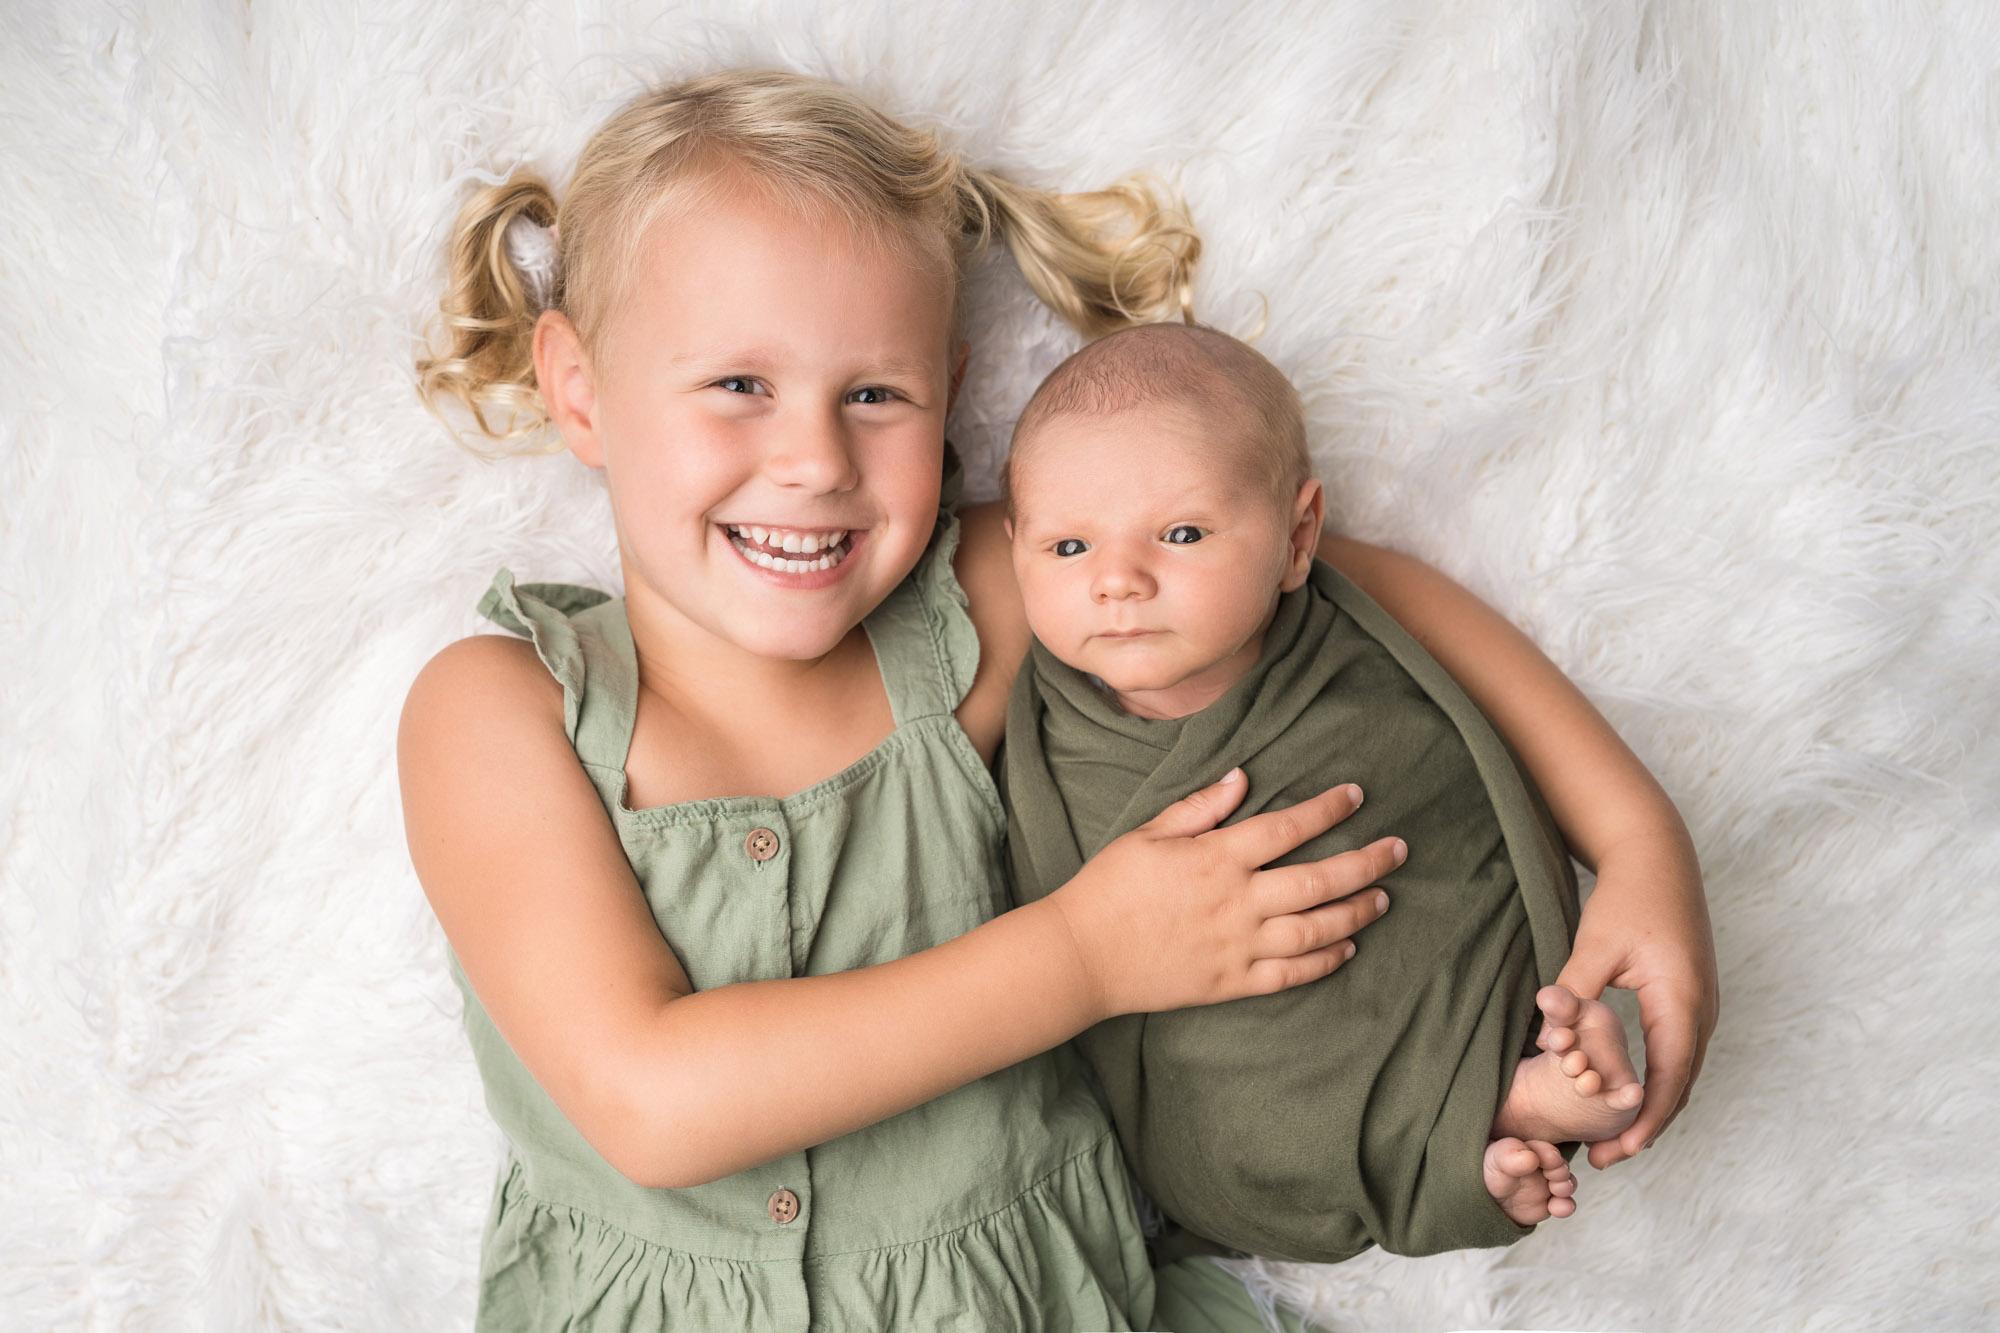 Affordable Gravesend Newborn photography